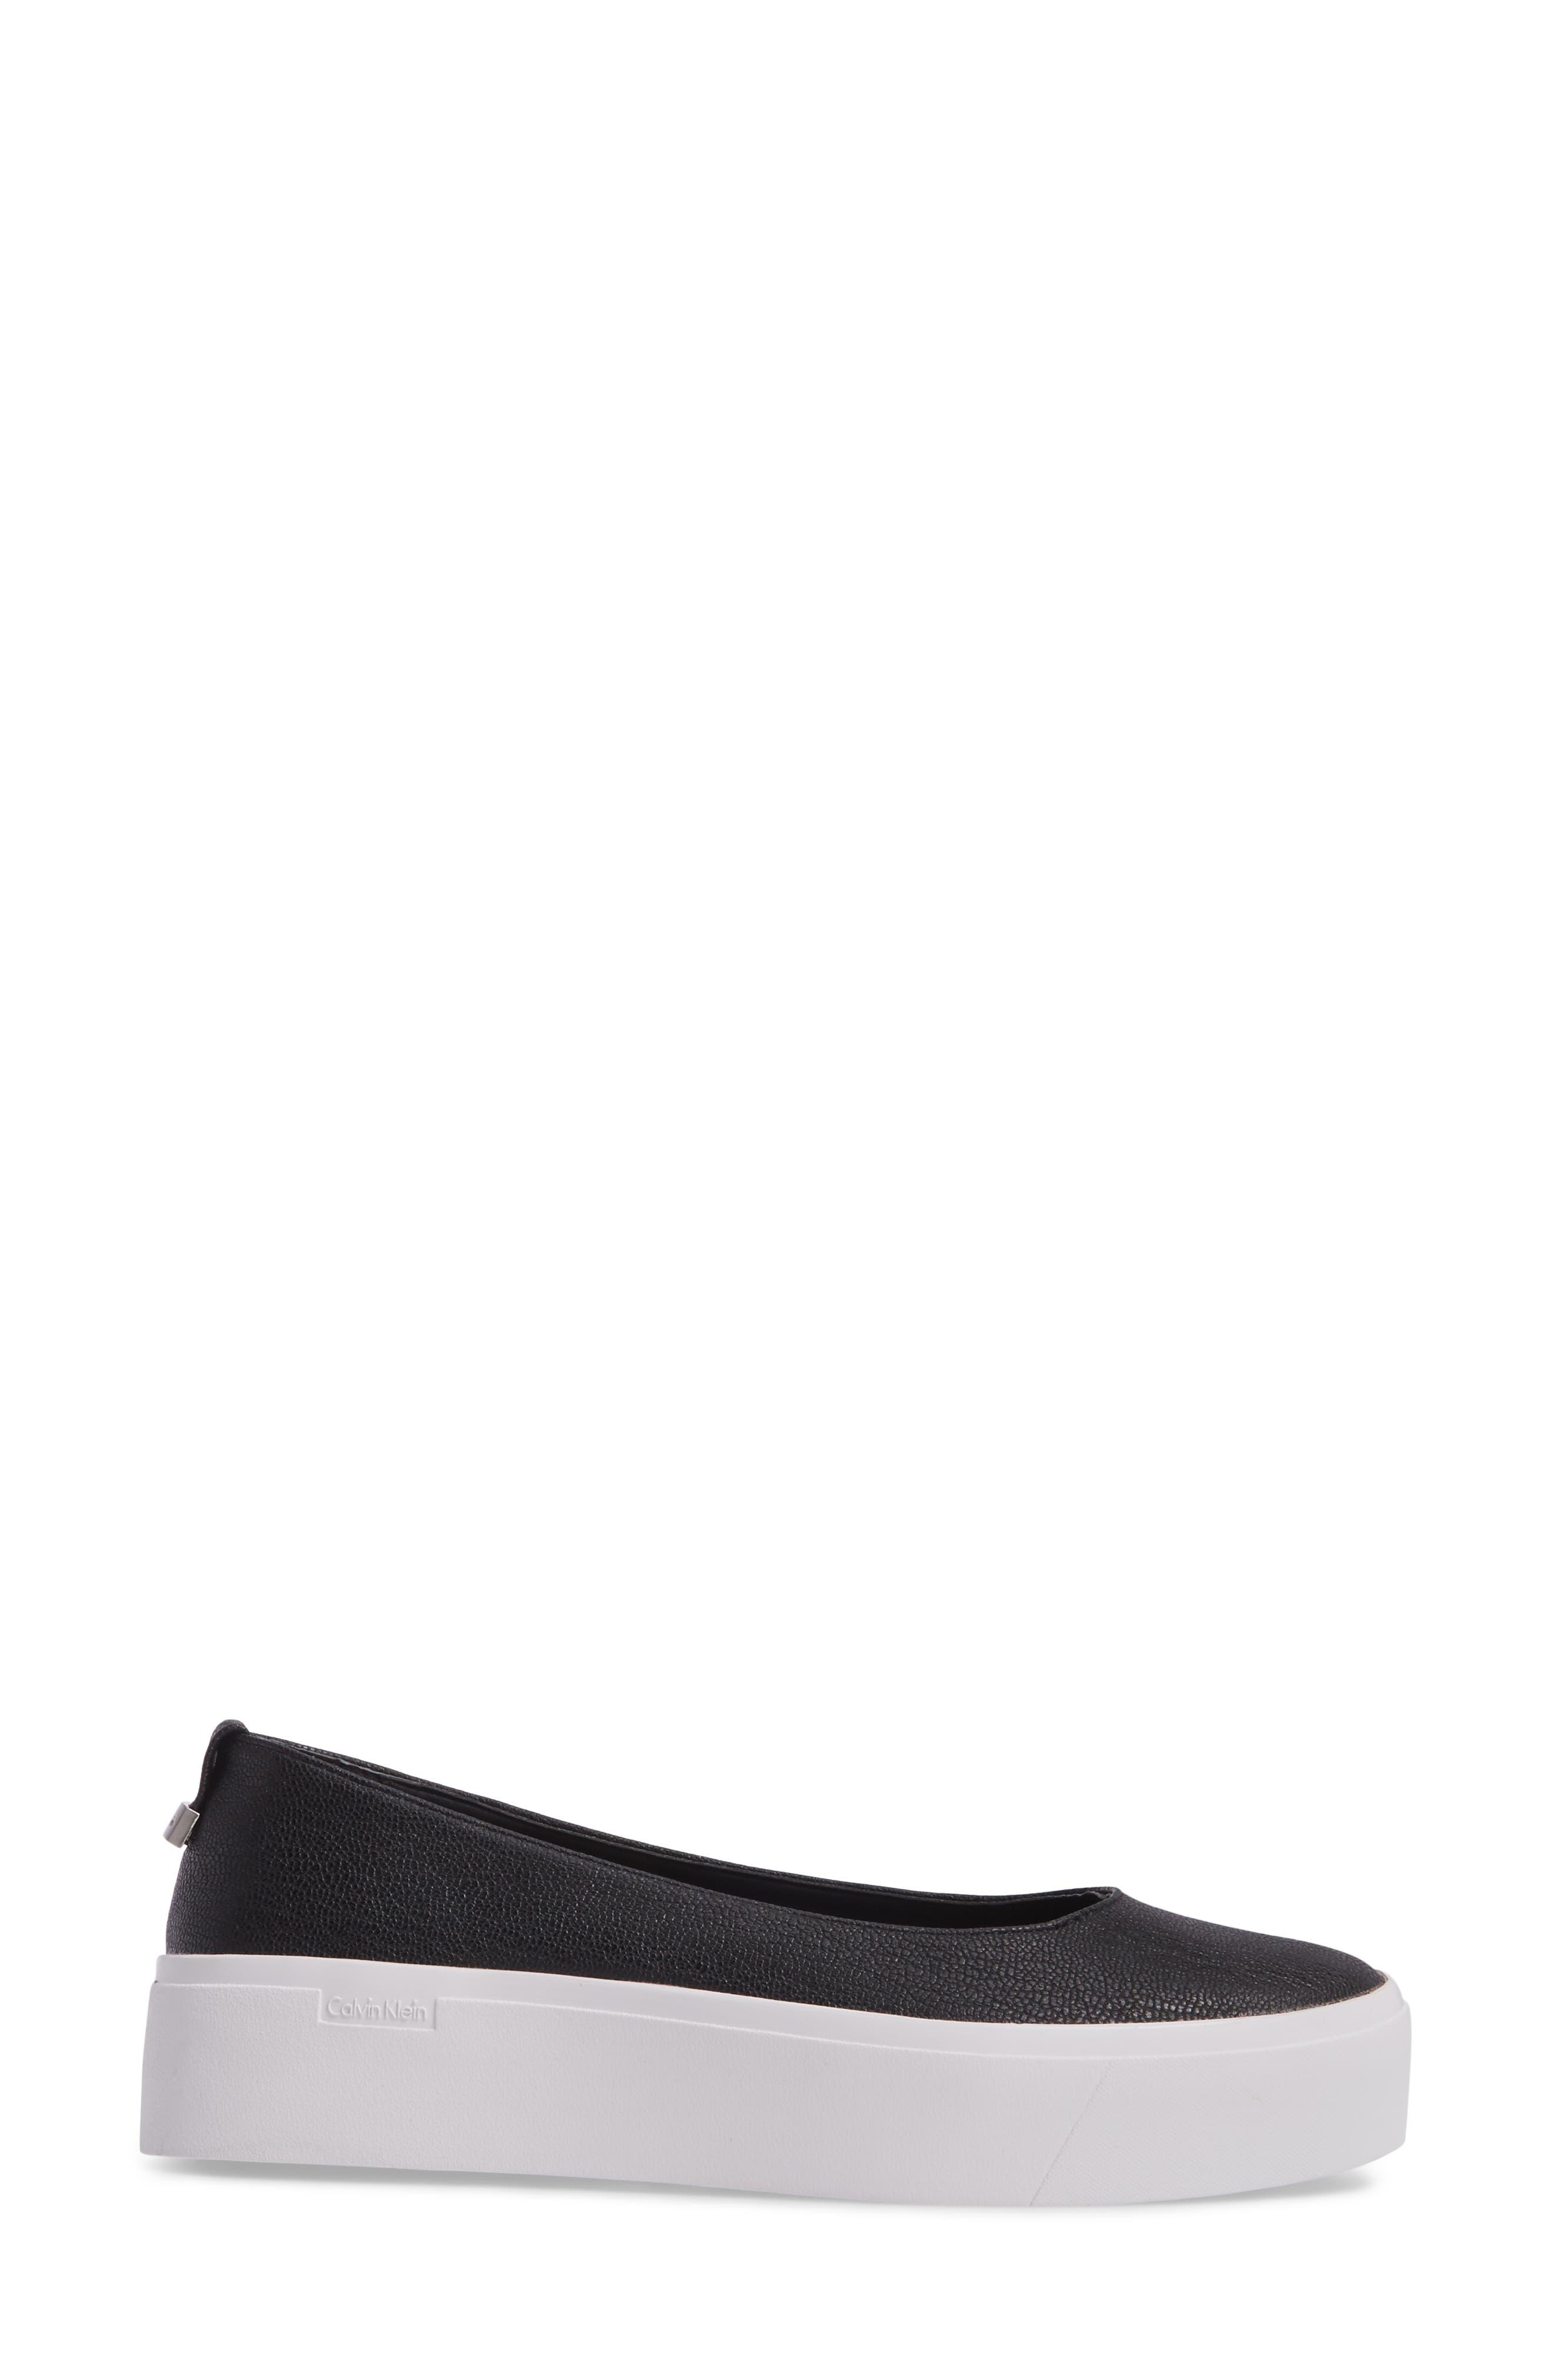 Janie Platform Flat,                             Alternate thumbnail 3, color,                             Black Pebble Leather